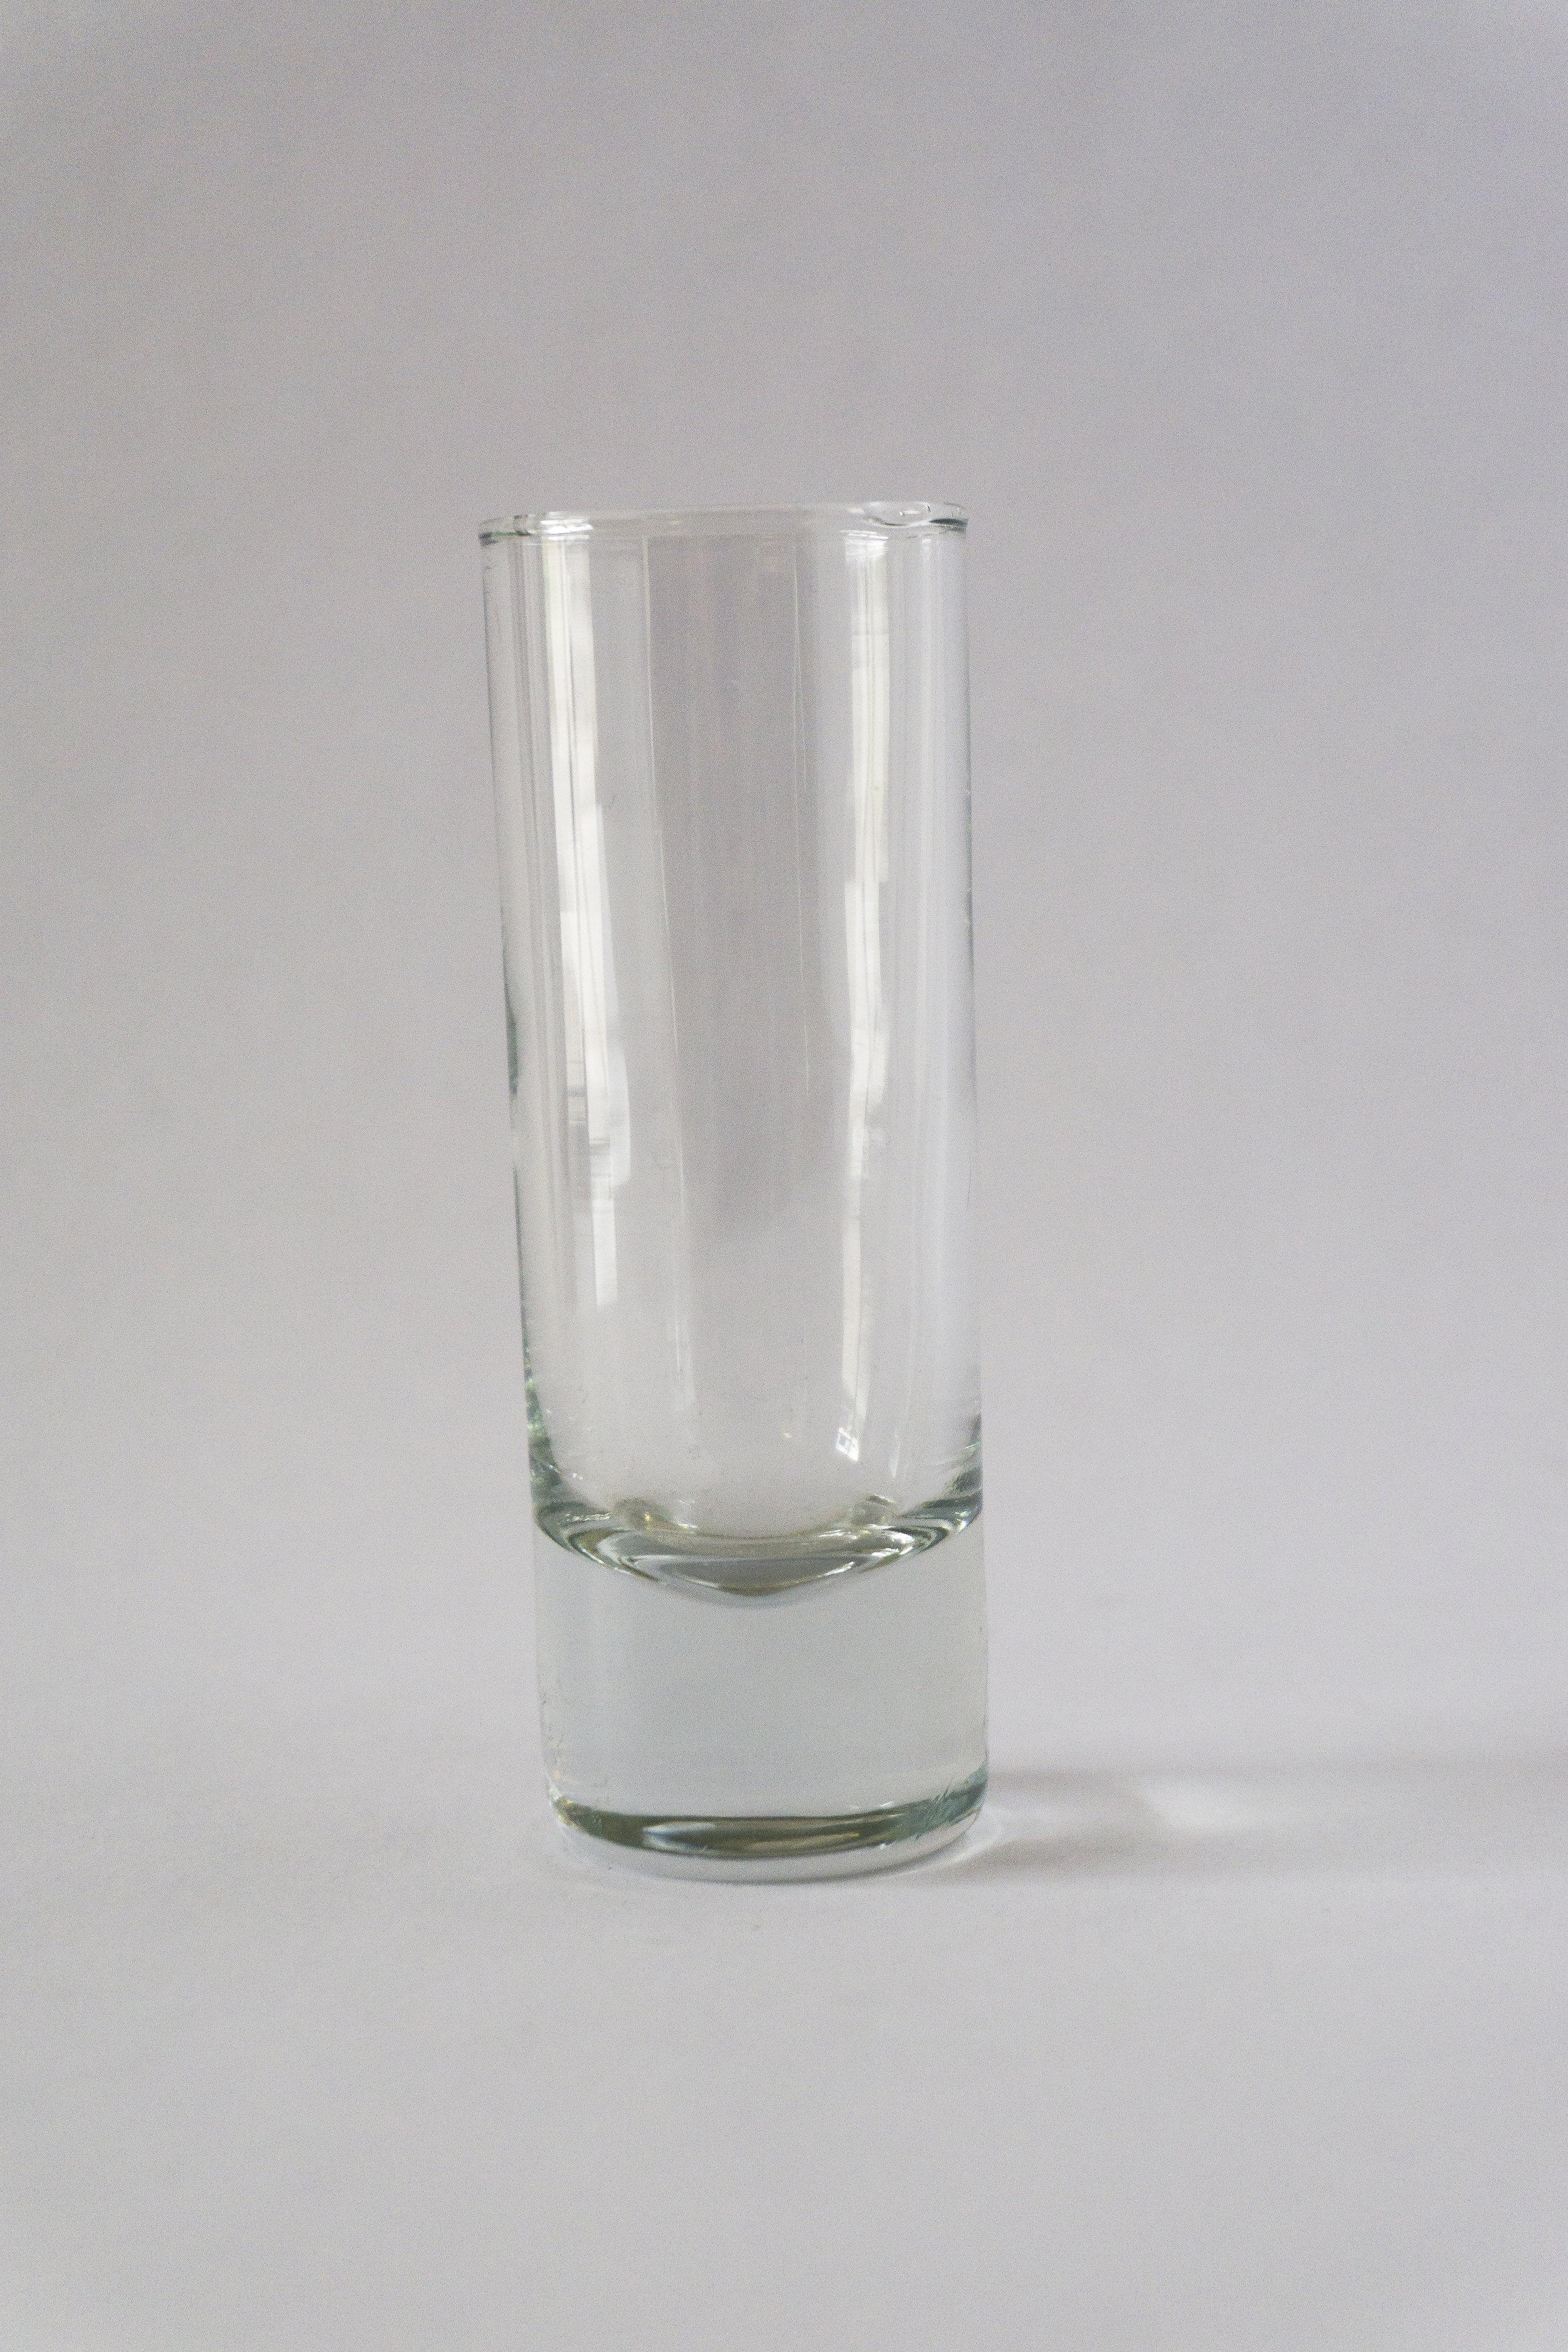 2.5 oz. Tequila Shot  Glass $0.70 each